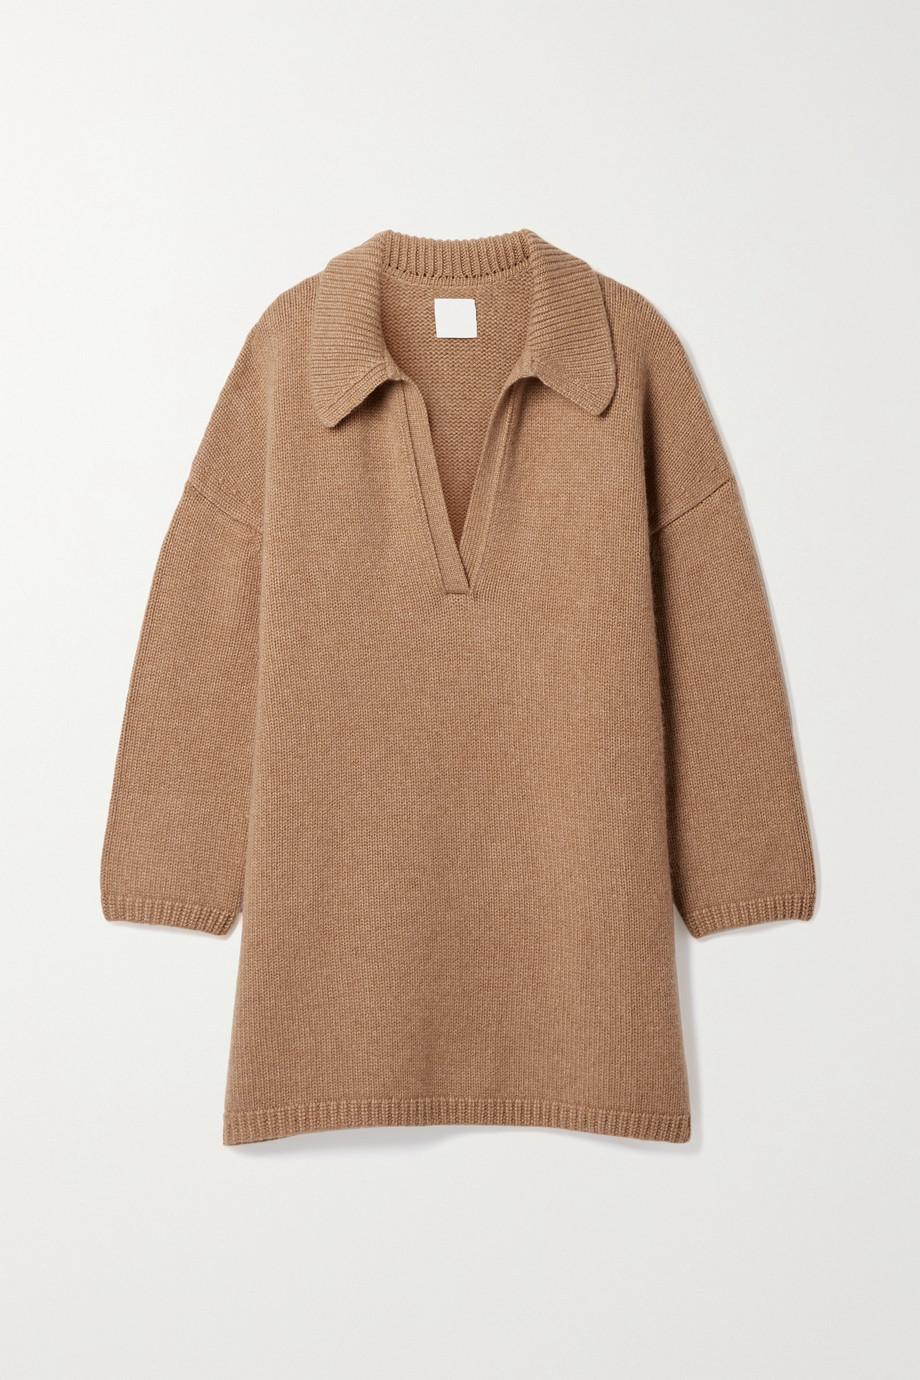 Khaite Sebastian oversized cashmere sweater